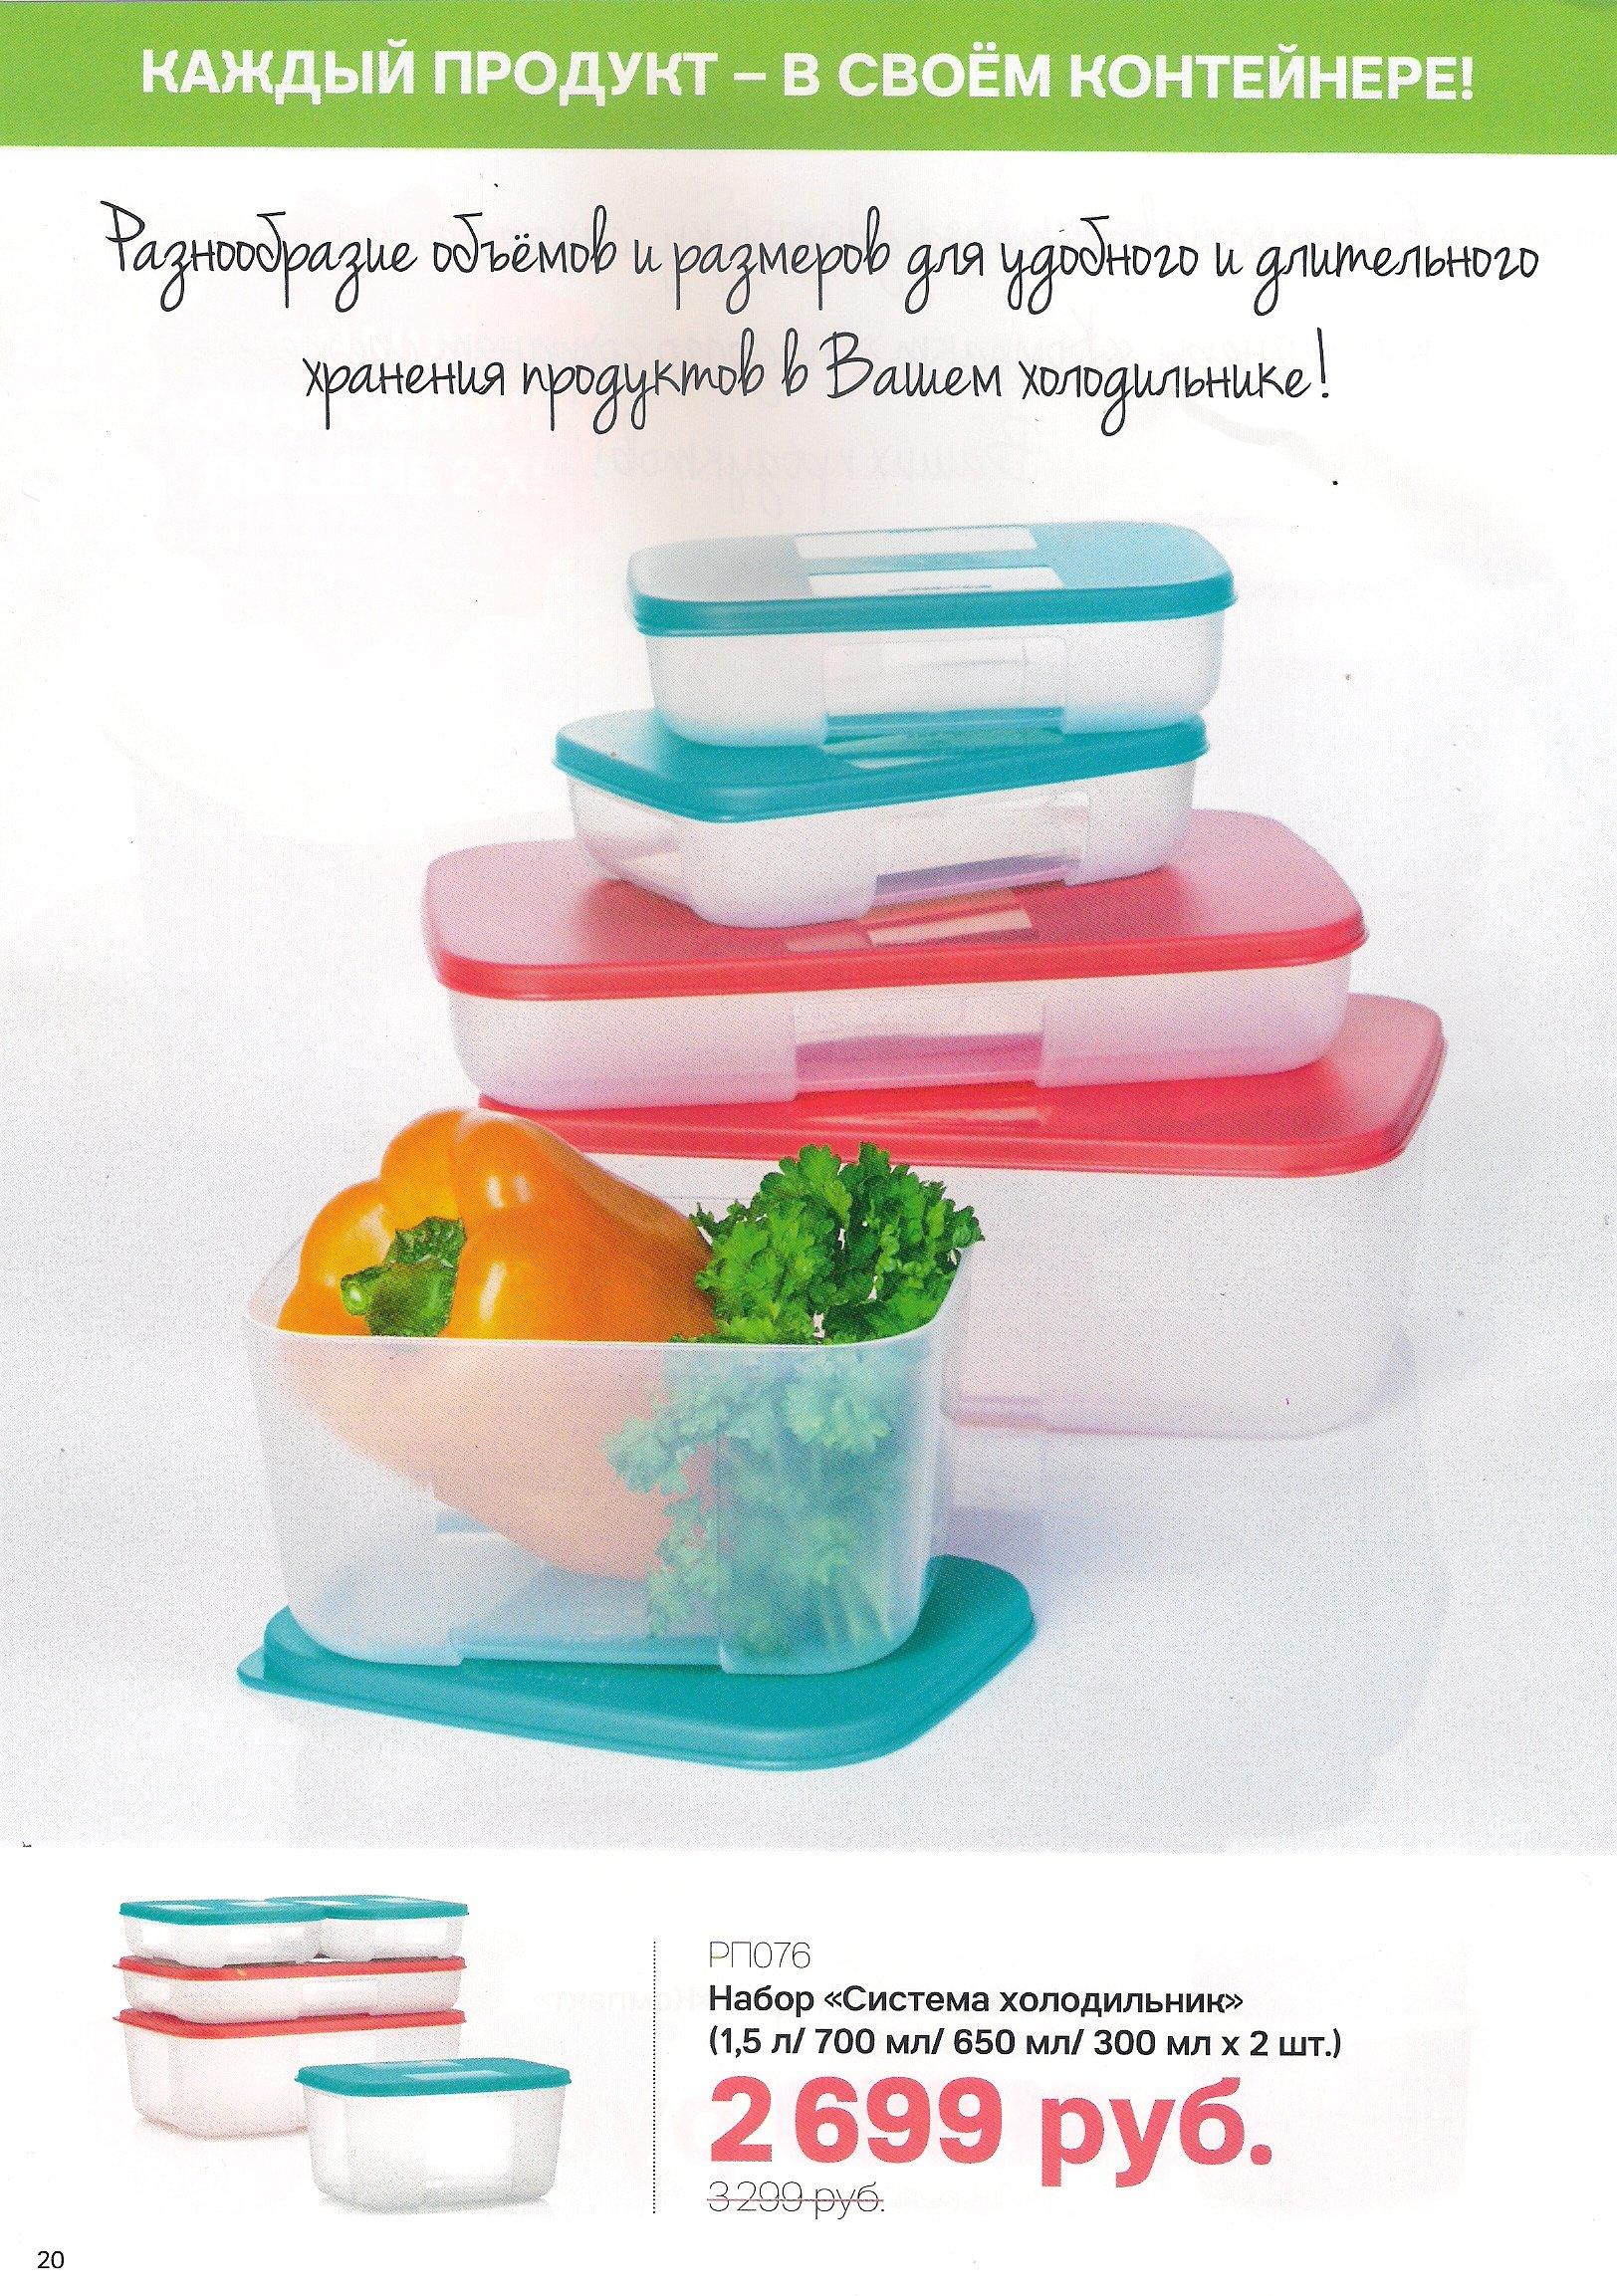 https://tupperware-online.ru/images/upload/20i.jpg